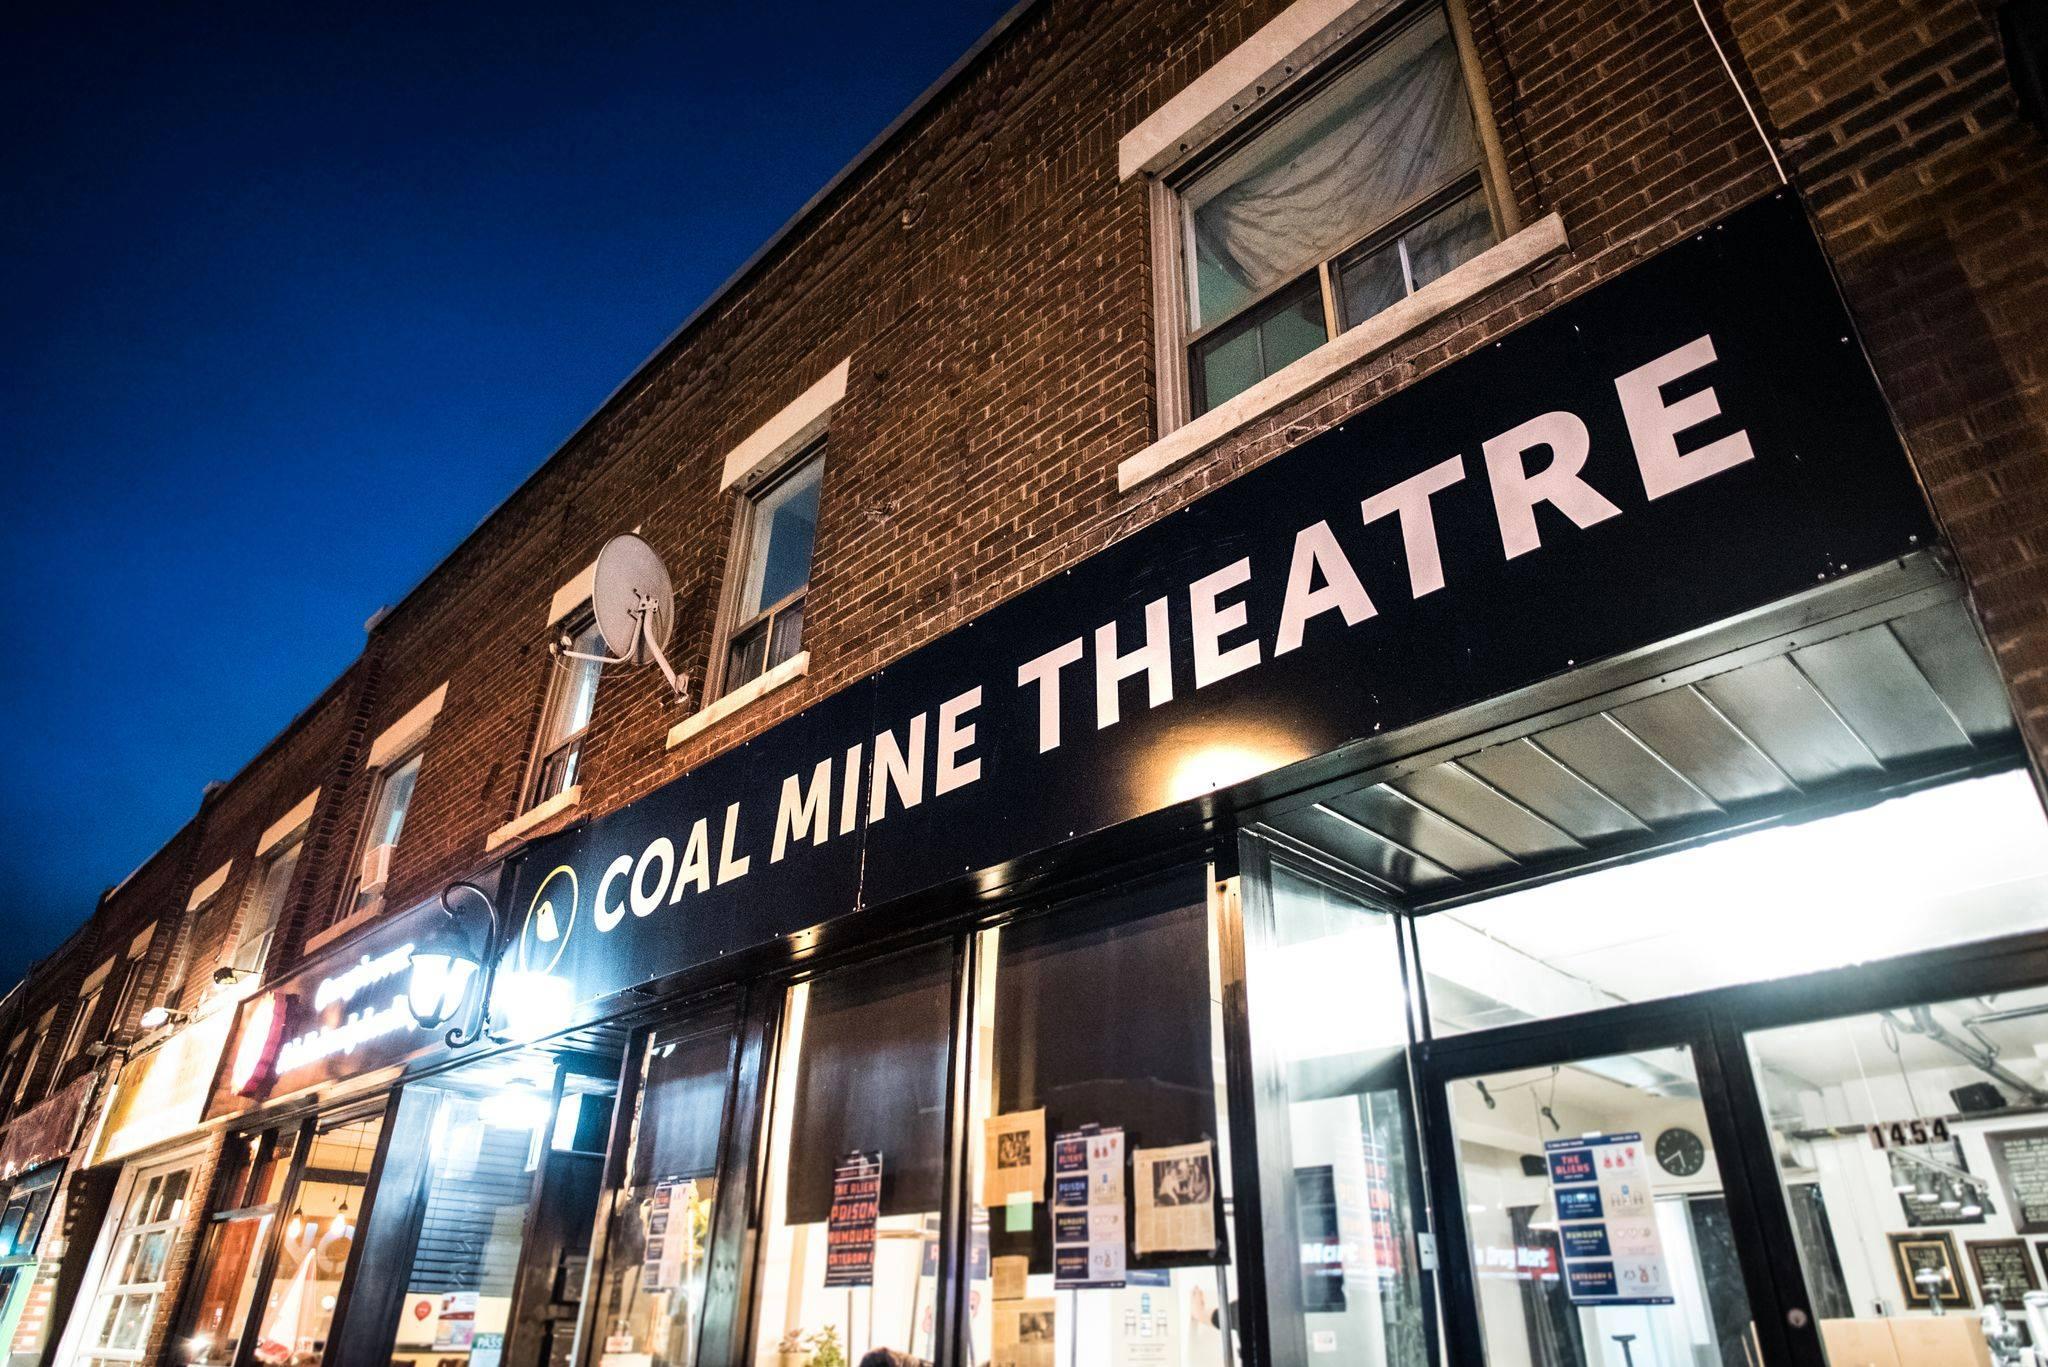 coal mine theatre